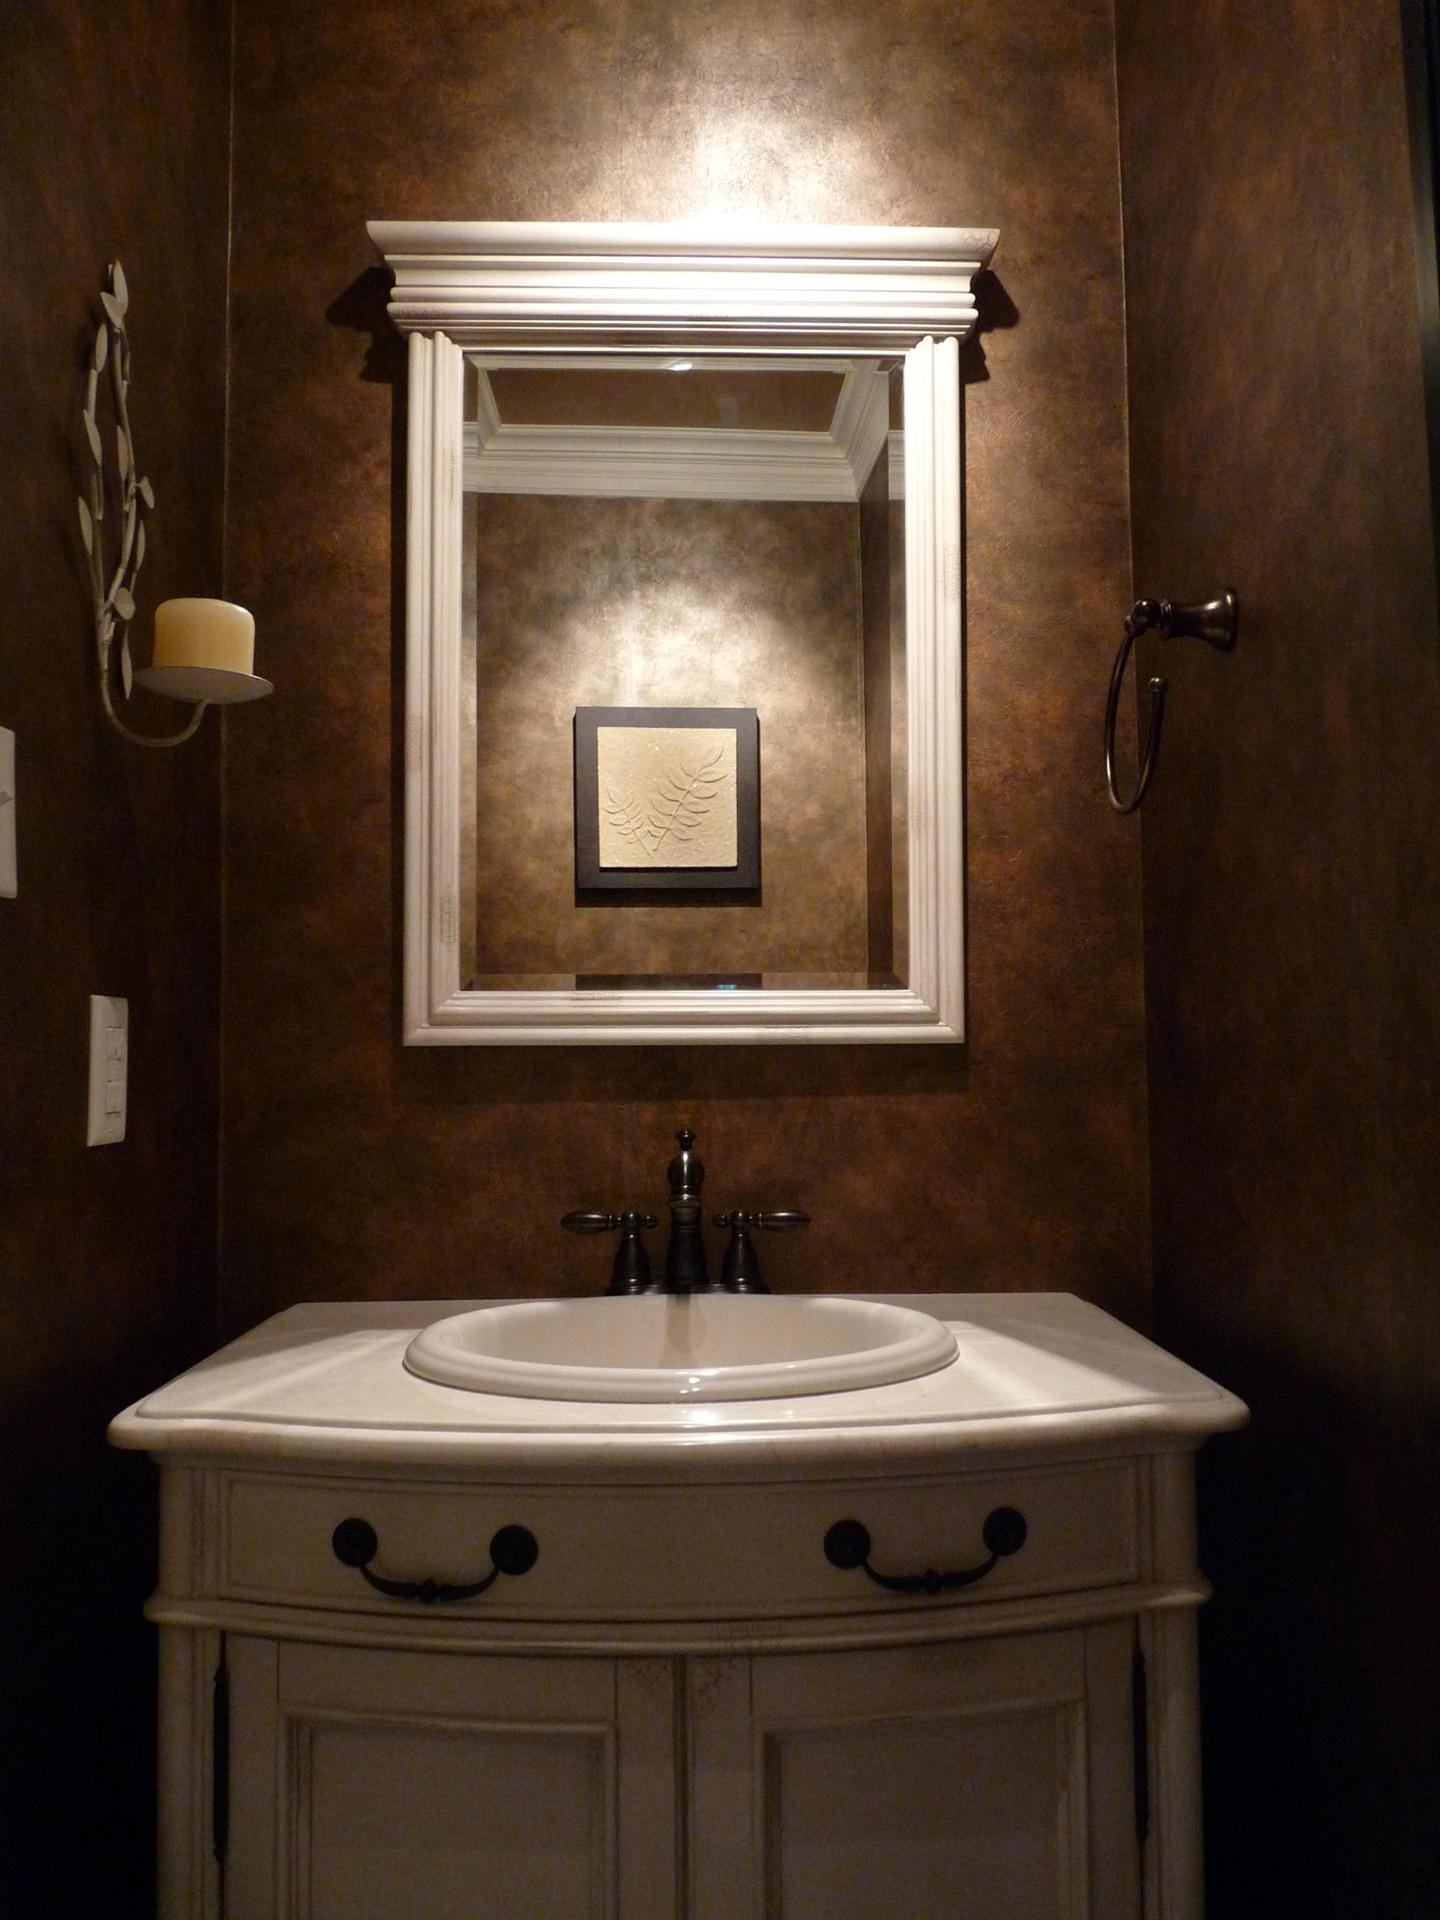 wallpapers for bathroom 2015   Grasscloth Wallpaper 1440x1920